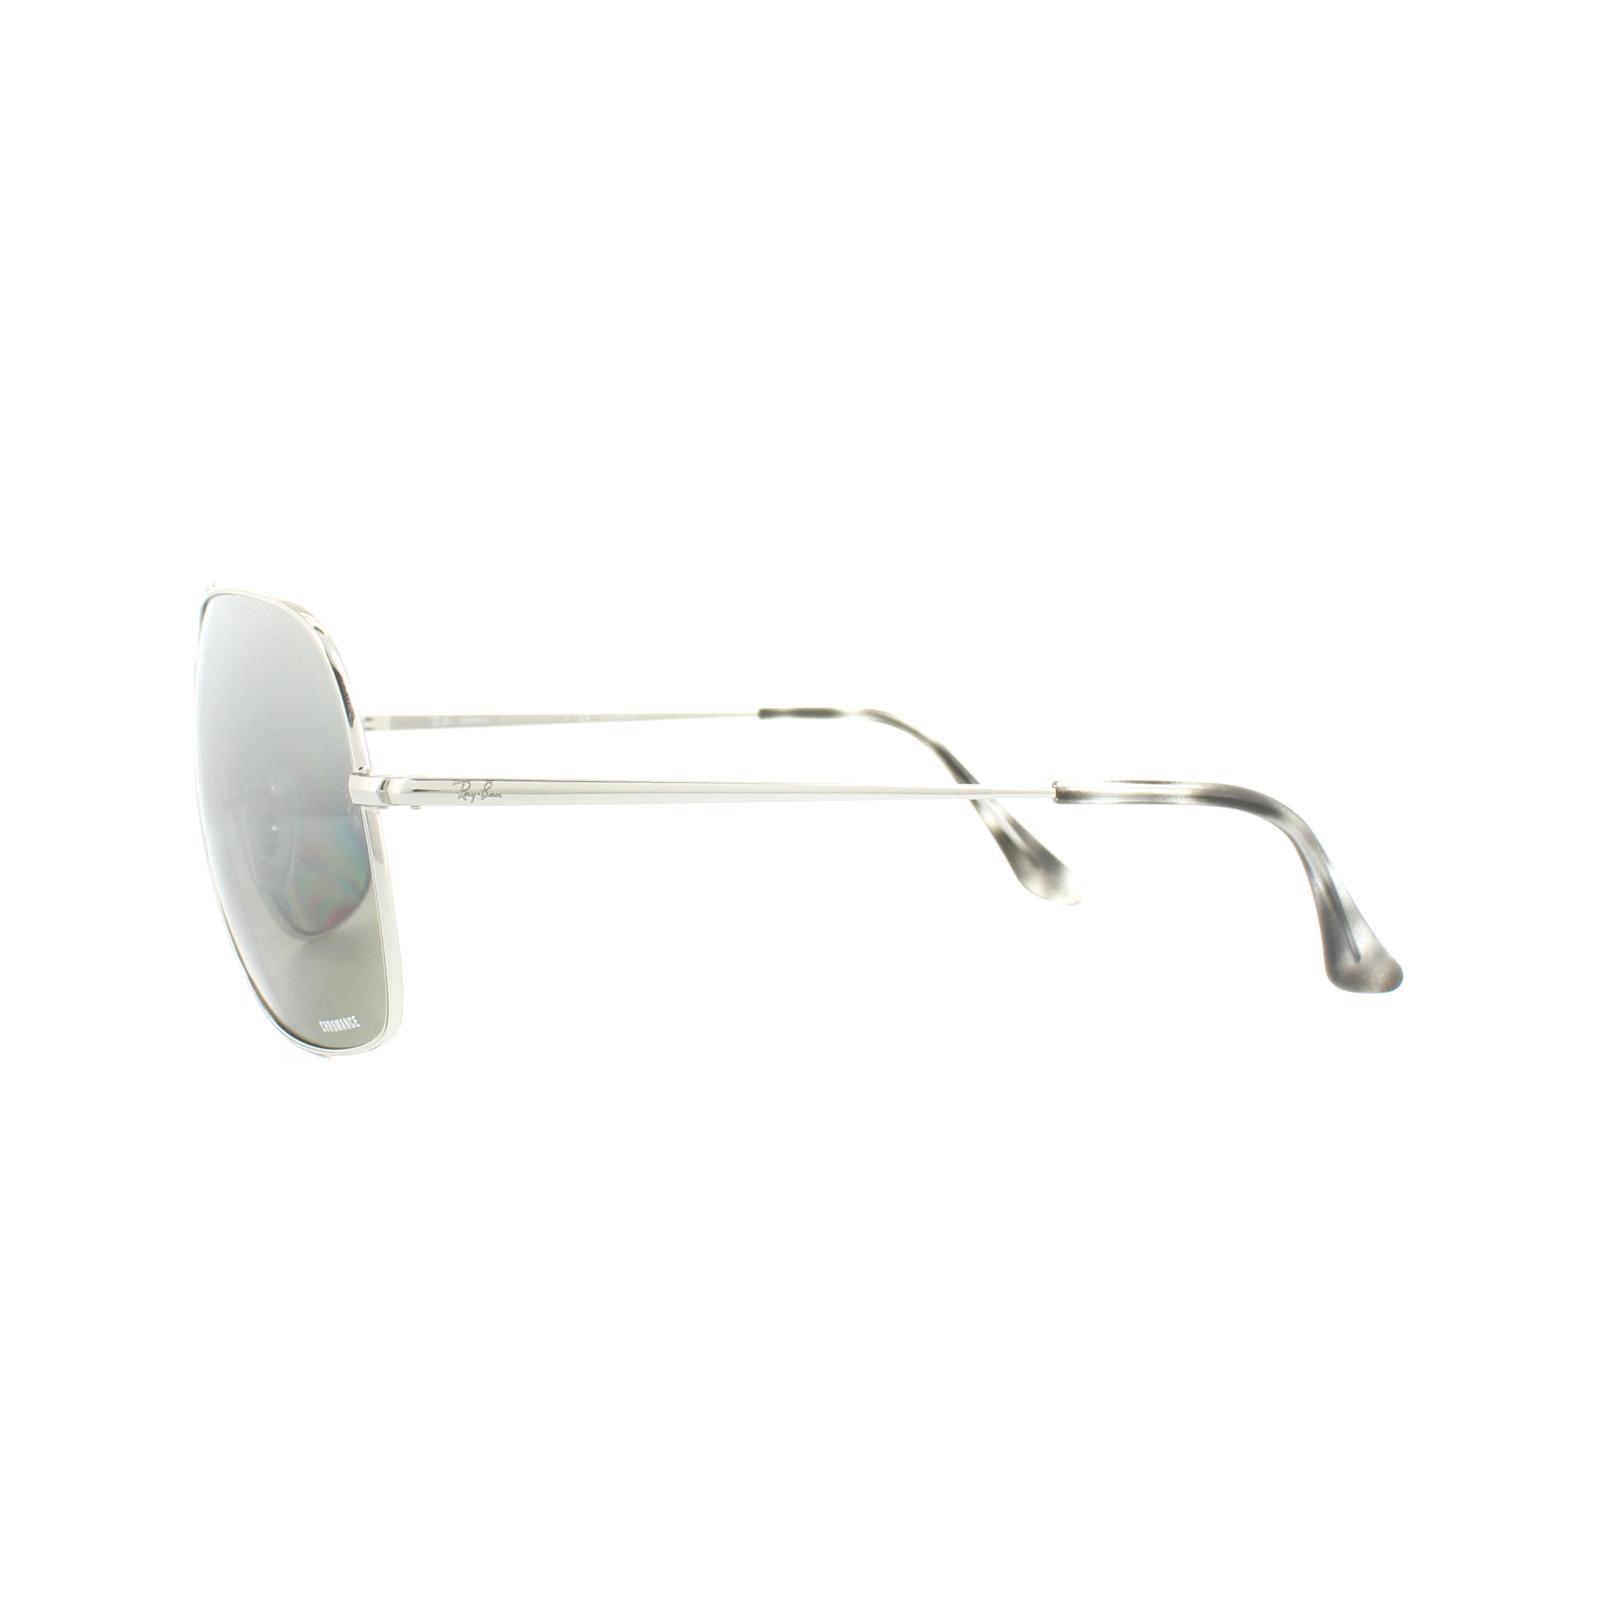 75f493d13e Sentinel Thumbnail 3. Sentinel Ray-Ban Sunglasses 3587CH 003 5J Silver  Polarized Silver Mirror Chromance. Sentinel Thumbnail 4